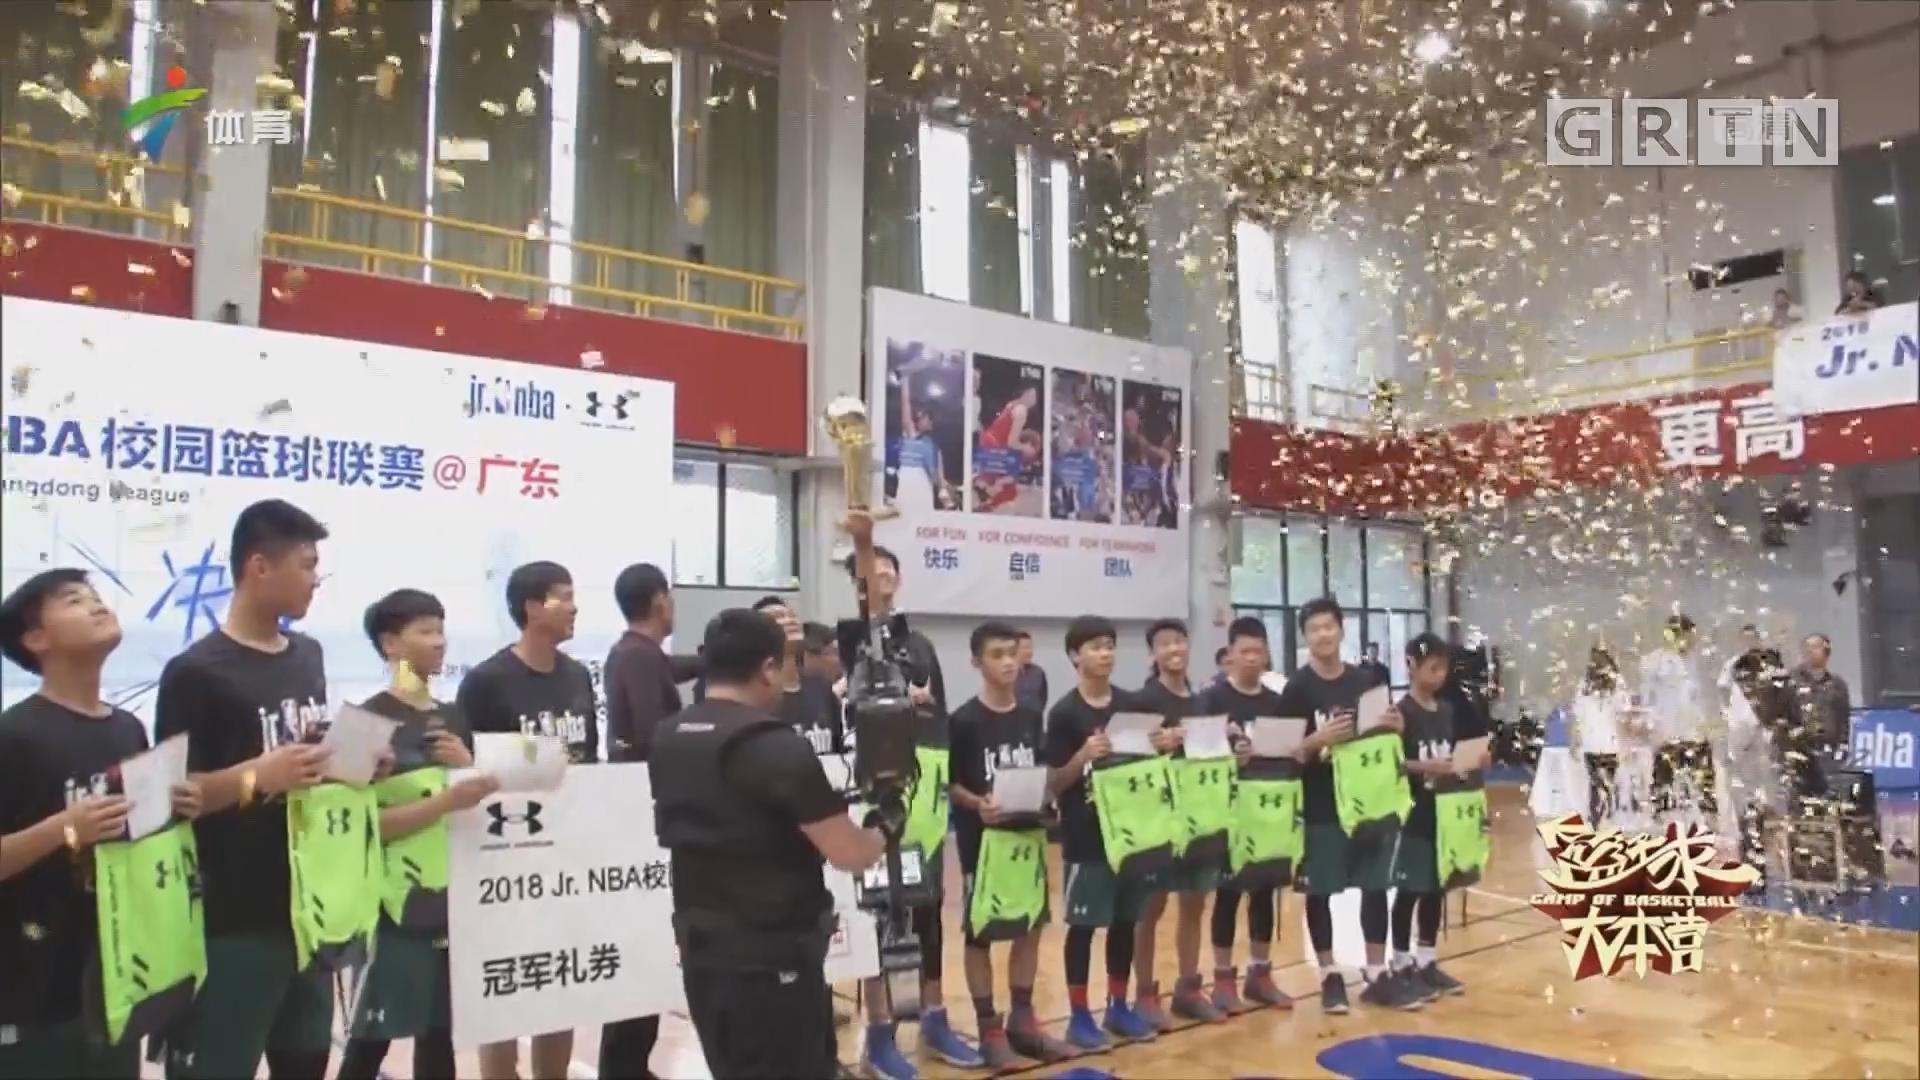 Jr.NBA广州赛区上演龙虎斗 广州一中摘得桂冠